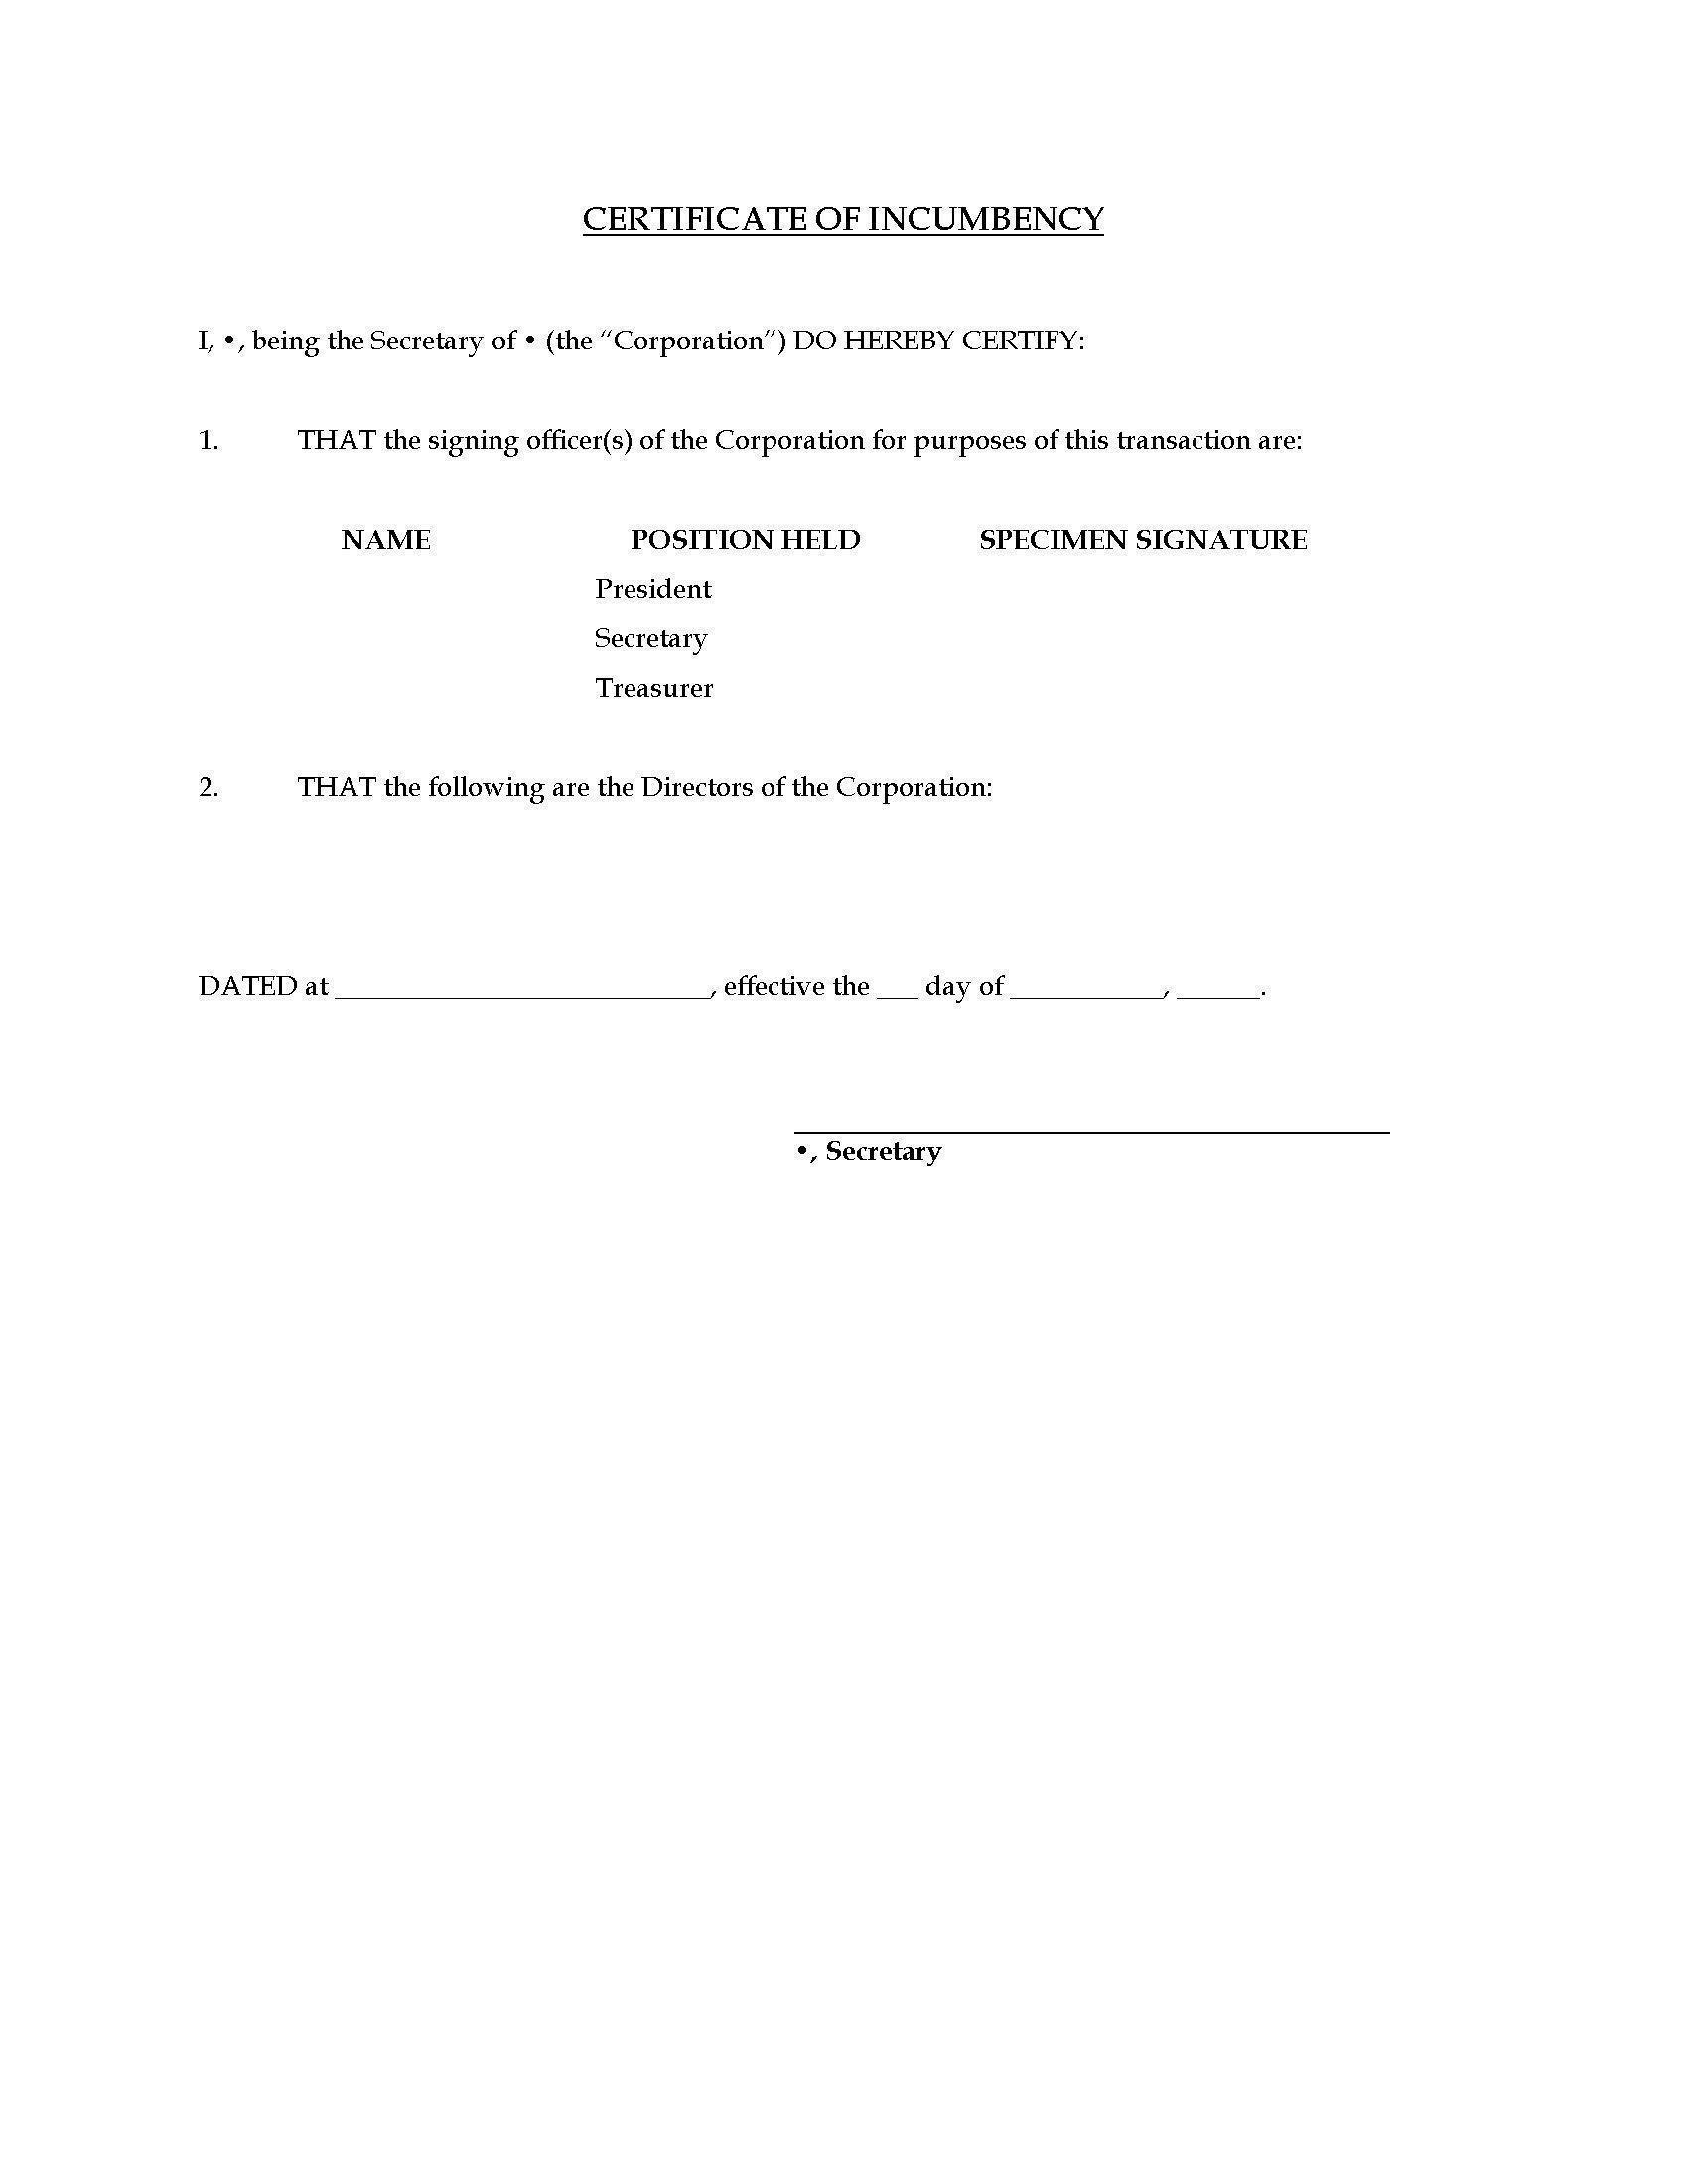 Certificate of Incumbency Template